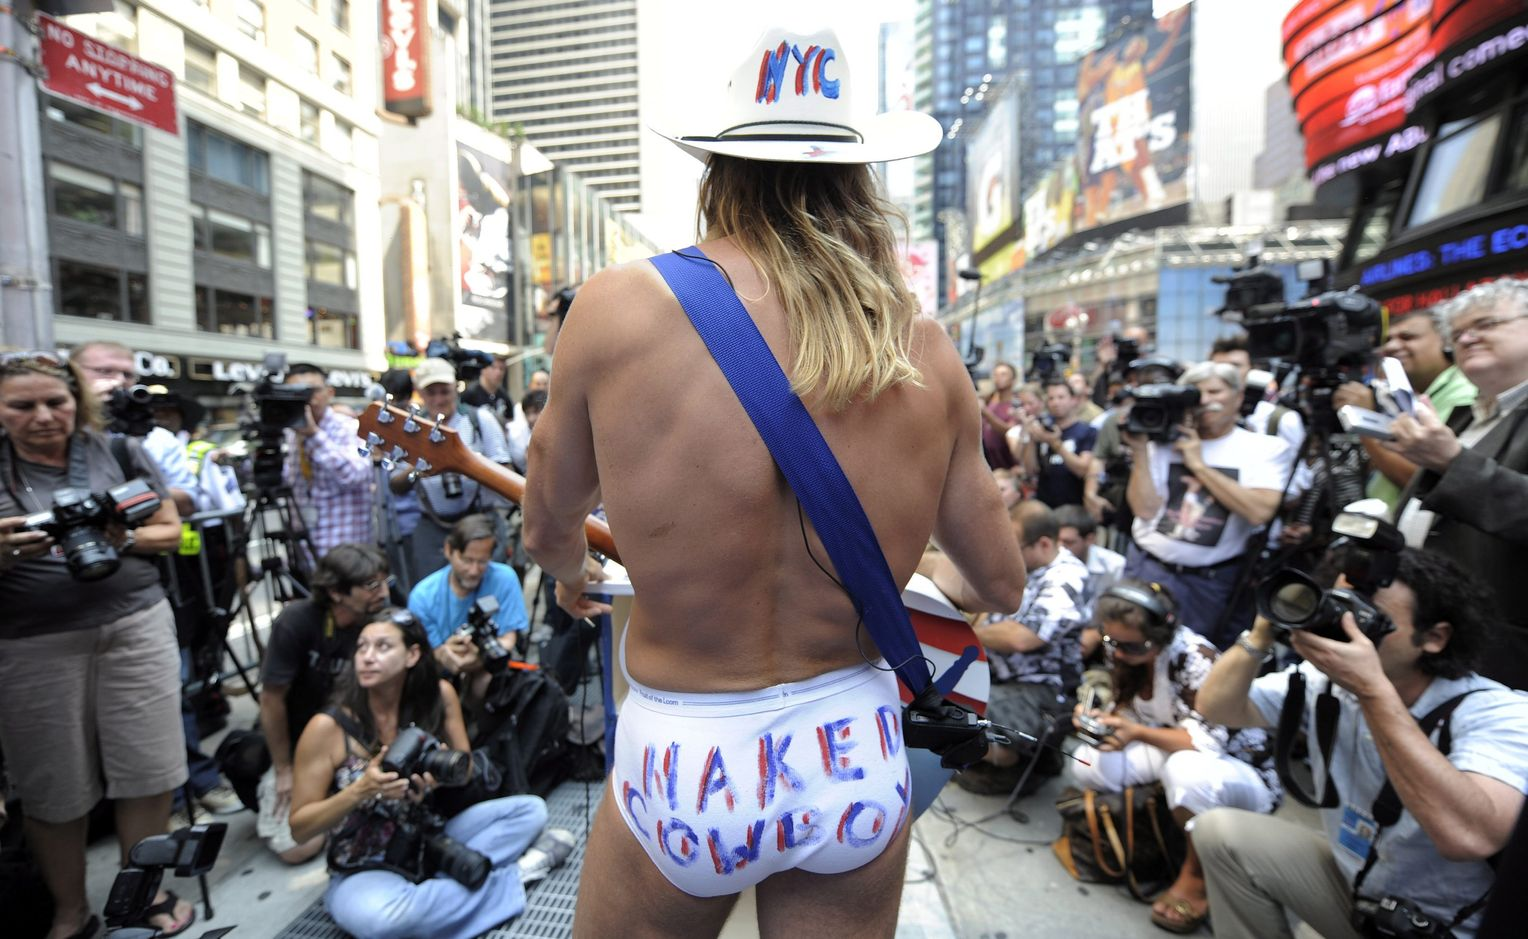 Bikini Nude Bei Musikfestival Images